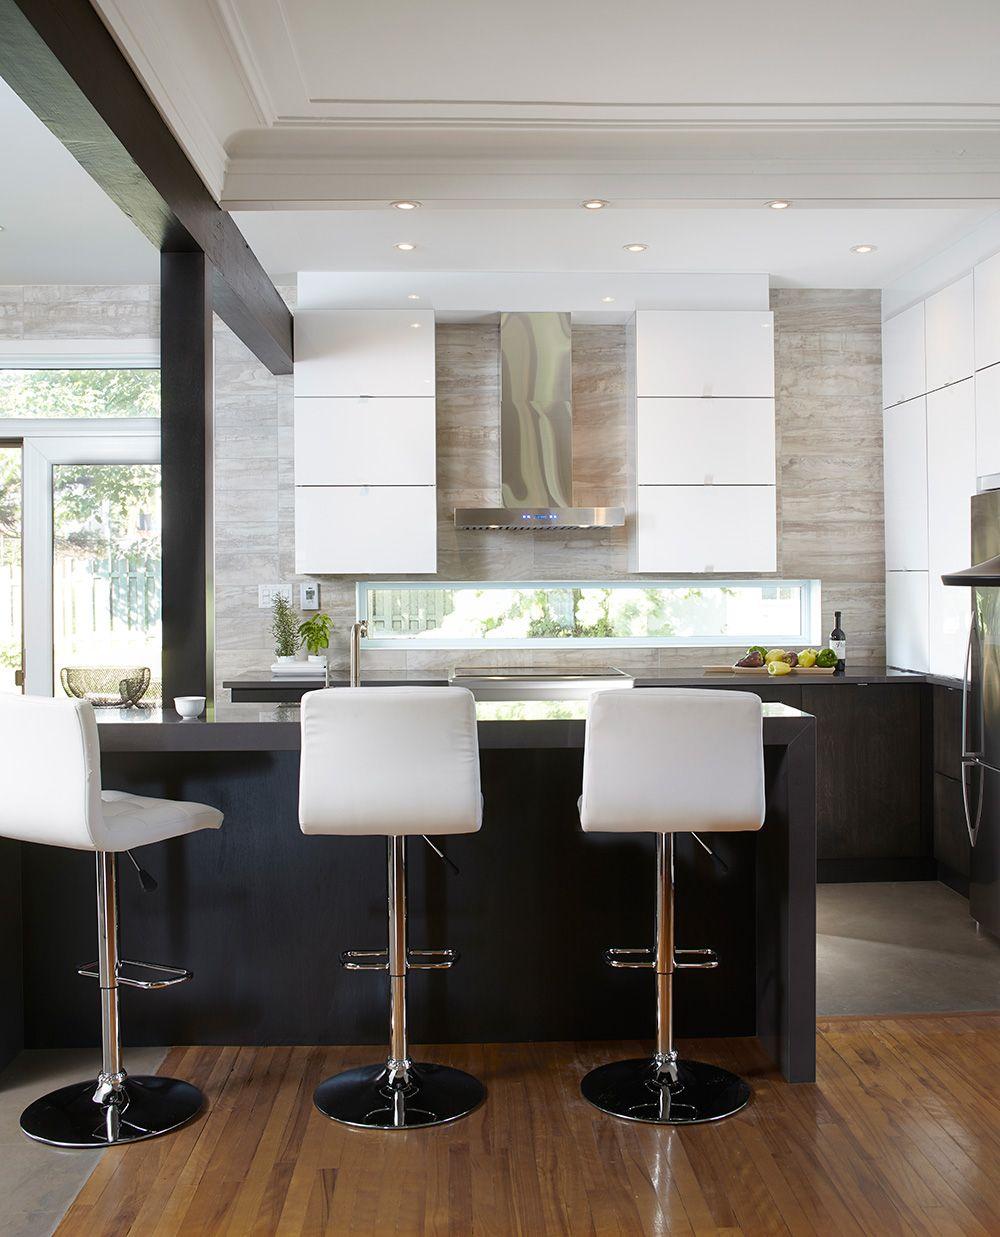 Armoires de cuisine moderne en acrylux merisier teint for Armoire de salle de bain moderne